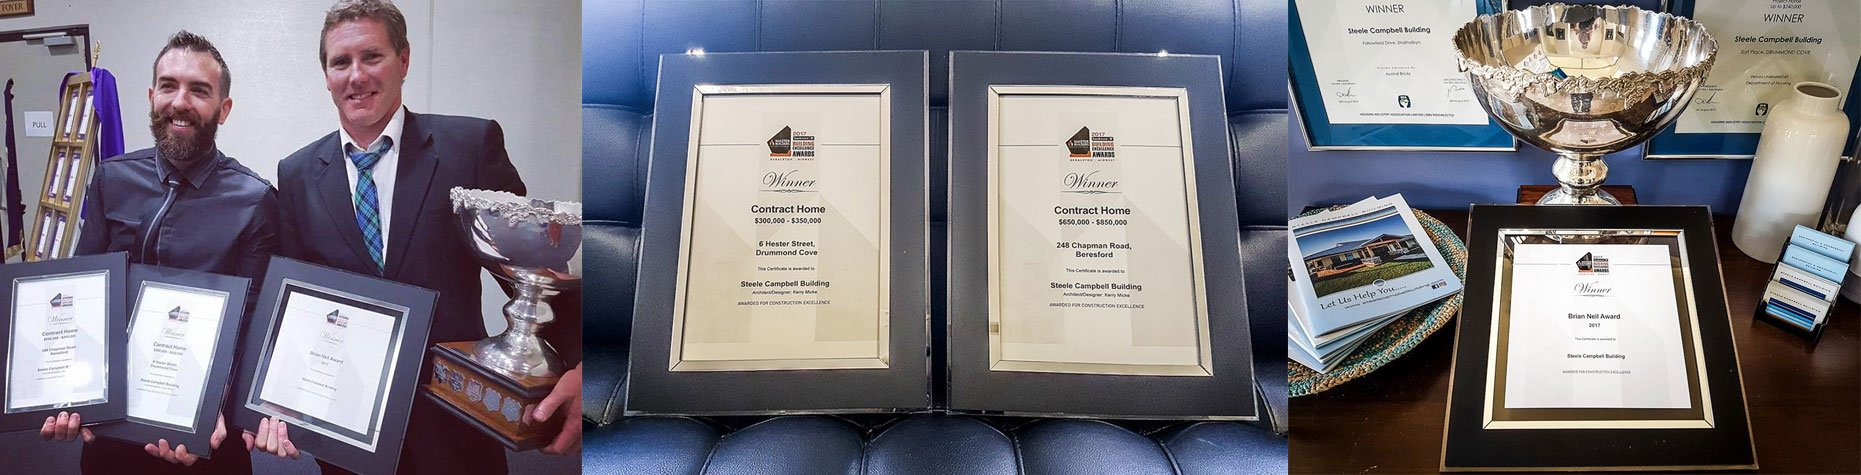 Steel Campbell Builders awards